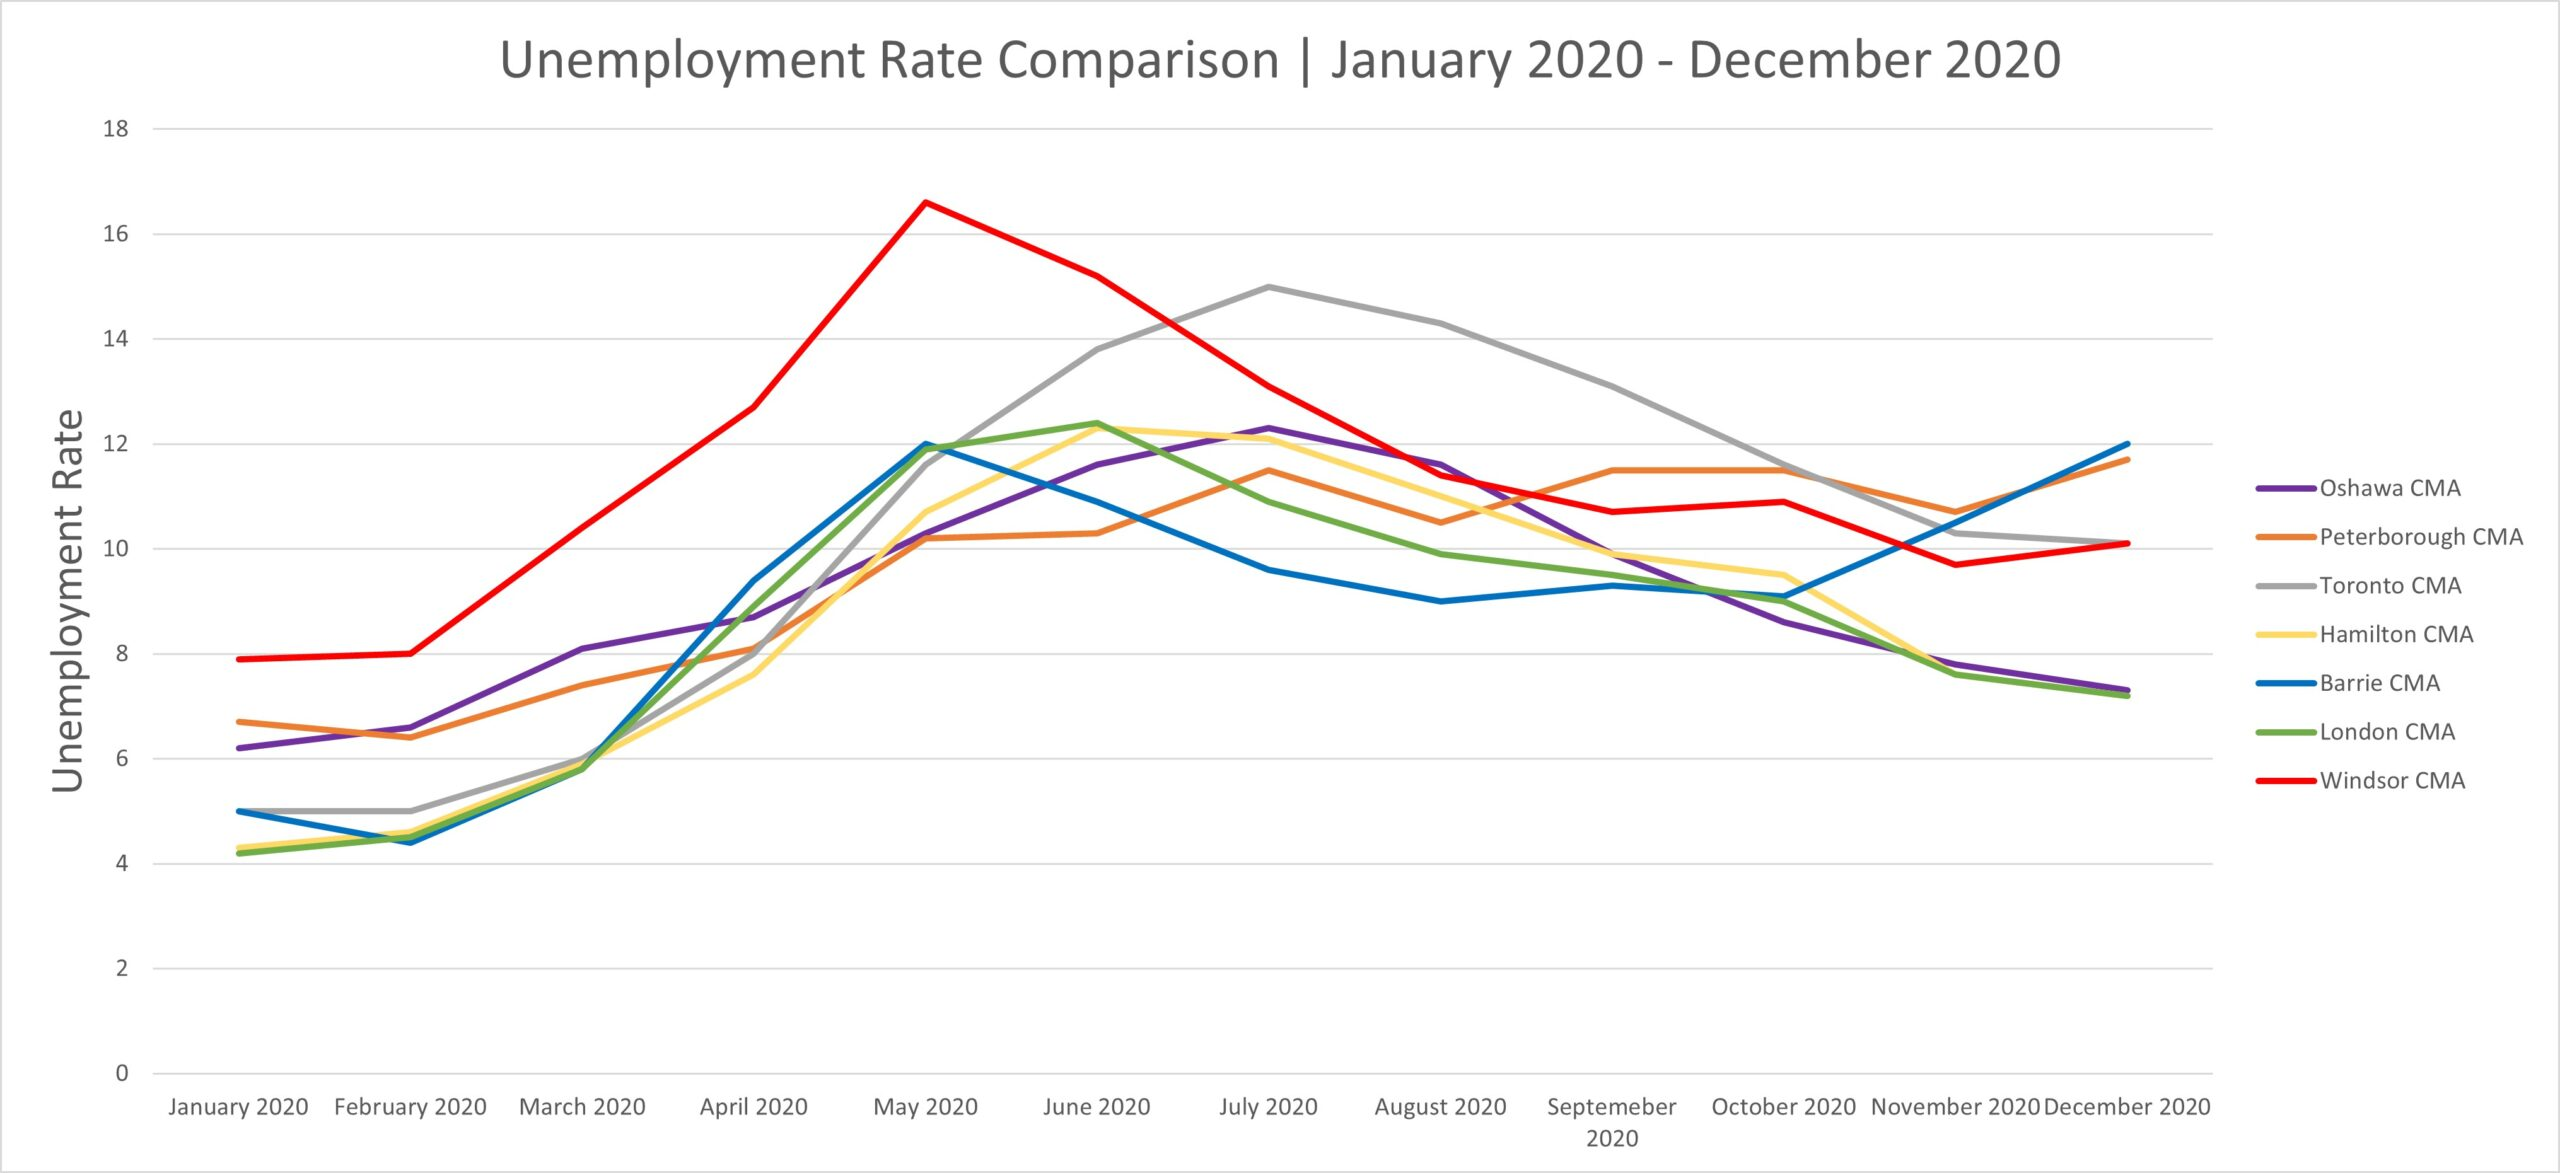 Unemployment Rate Comparison January 2020 -November 2020